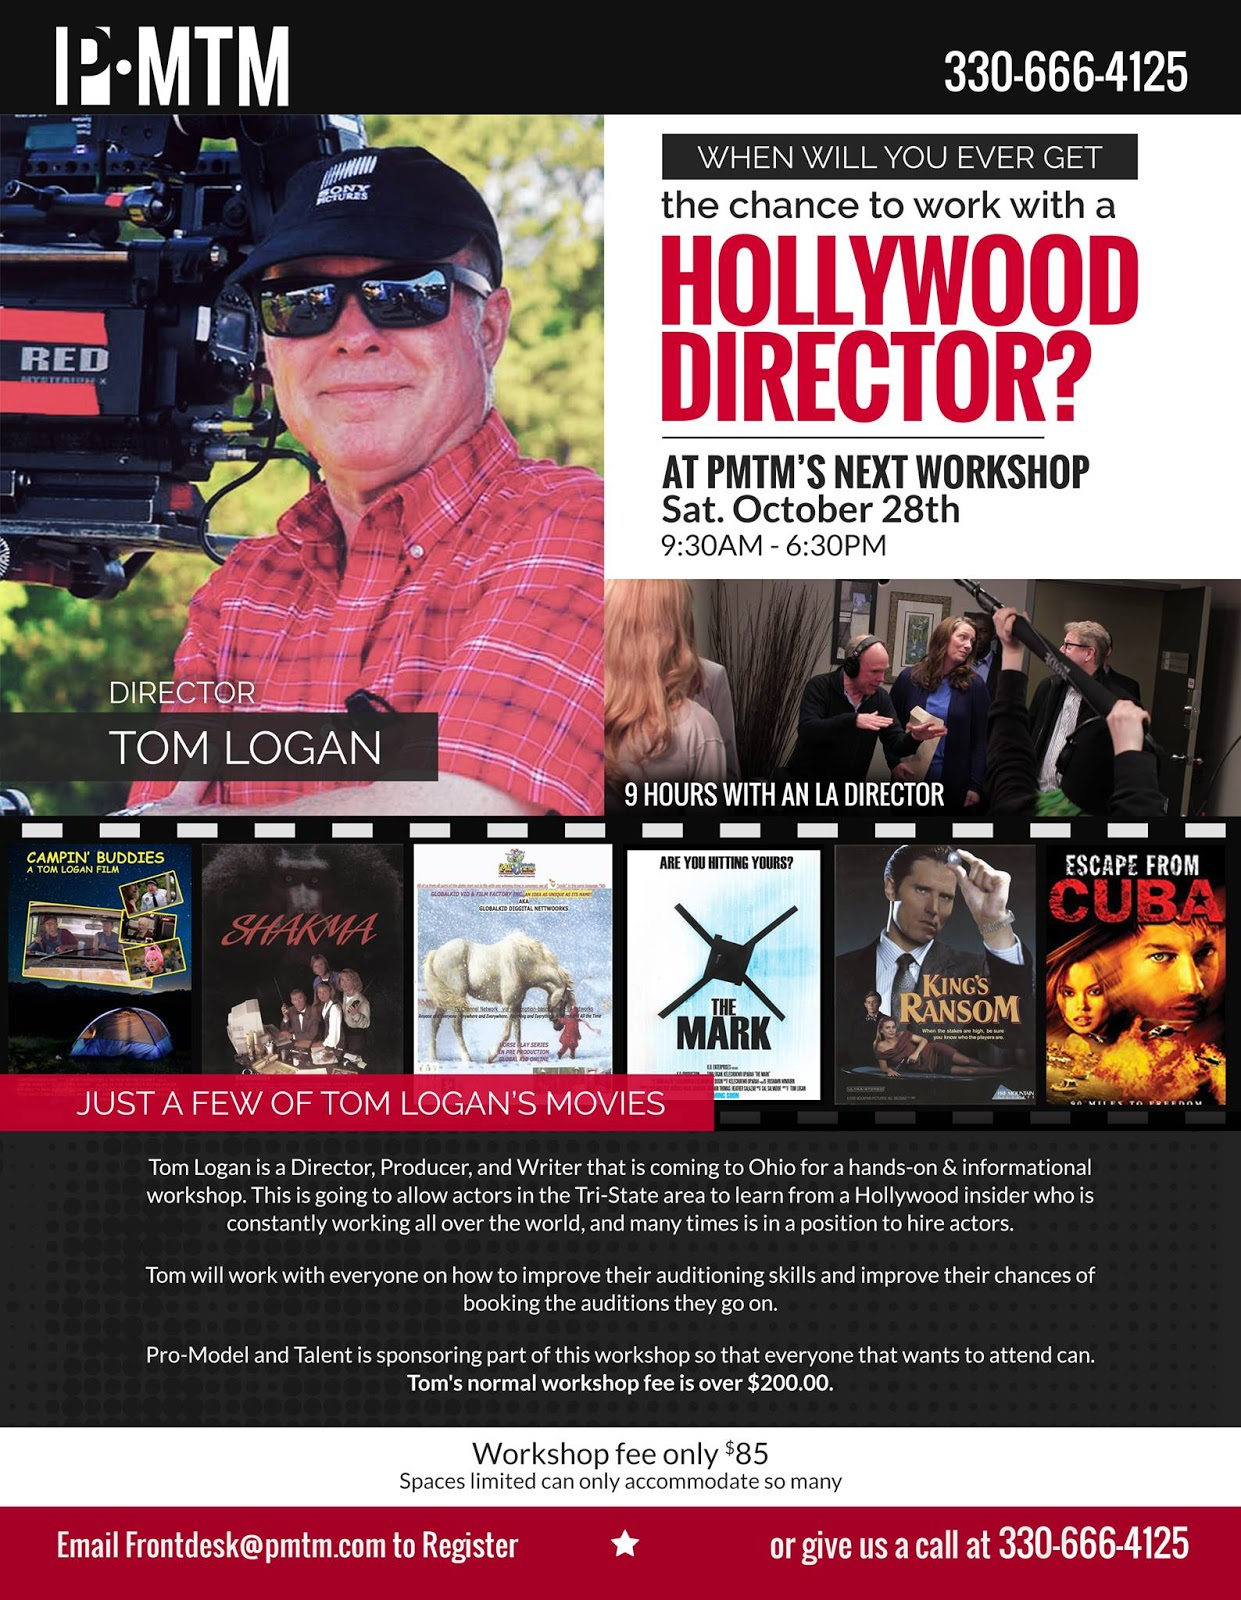 tom logan director movies